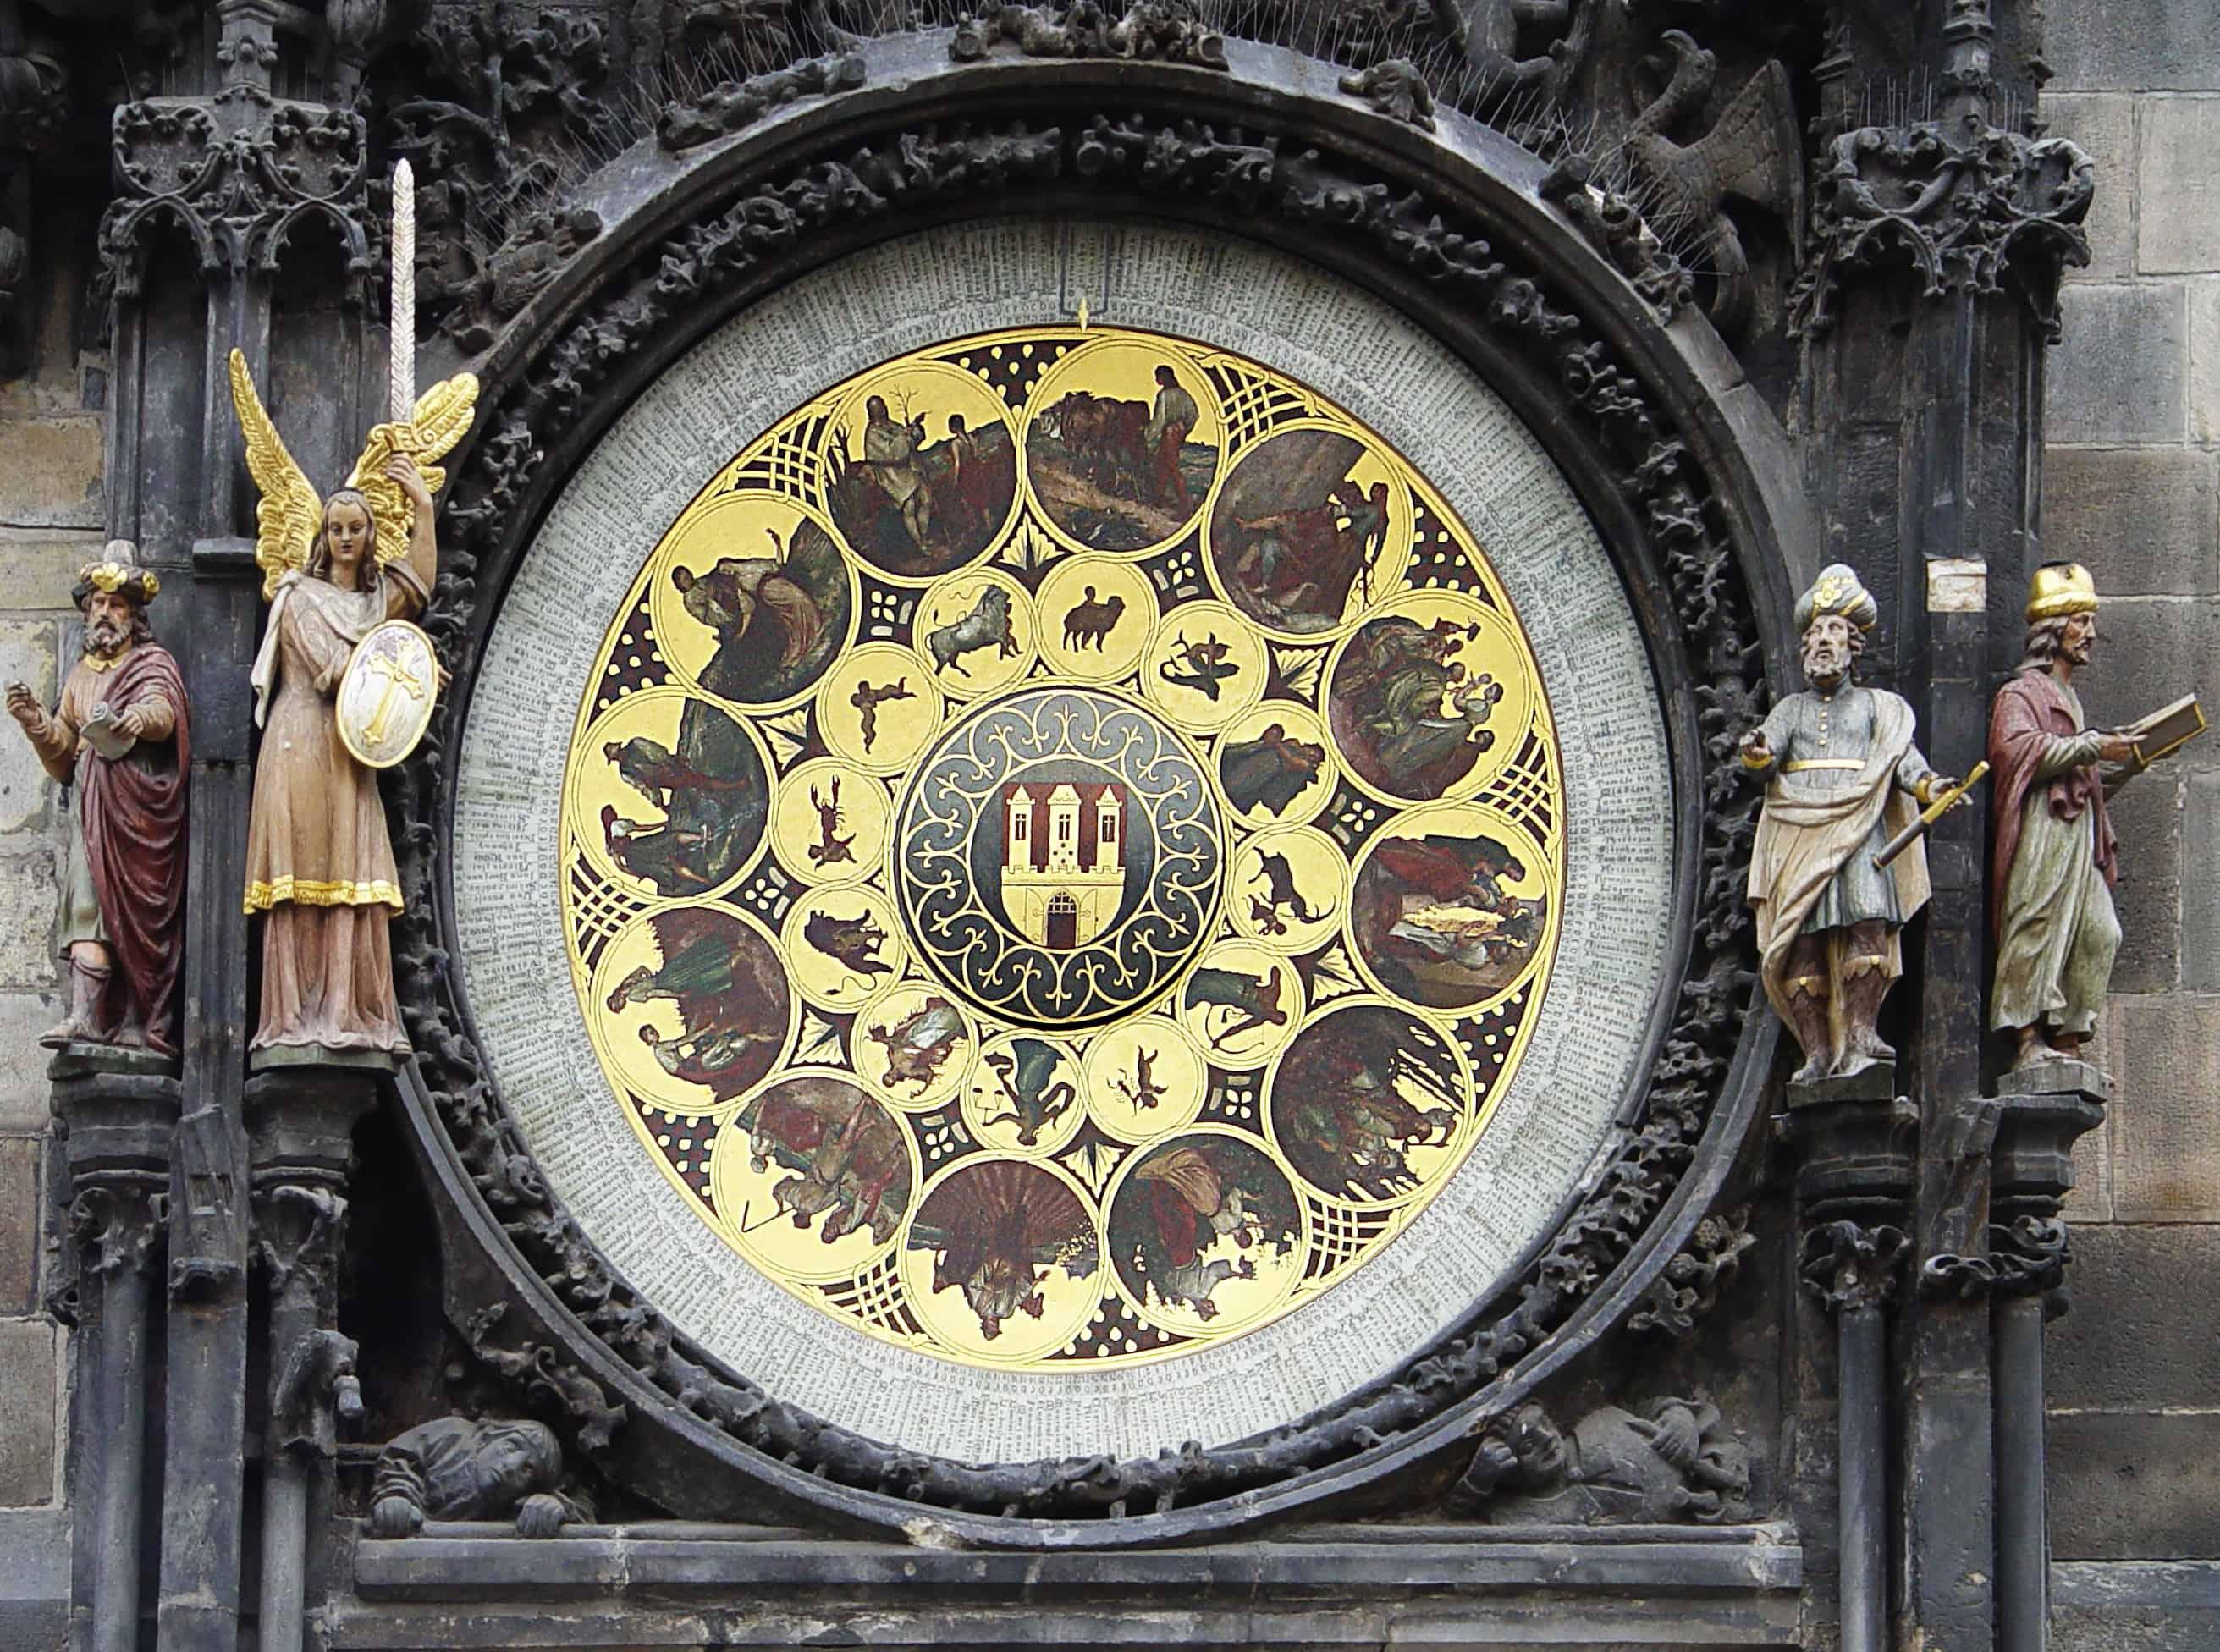 Calendar of the Astronomical Clock